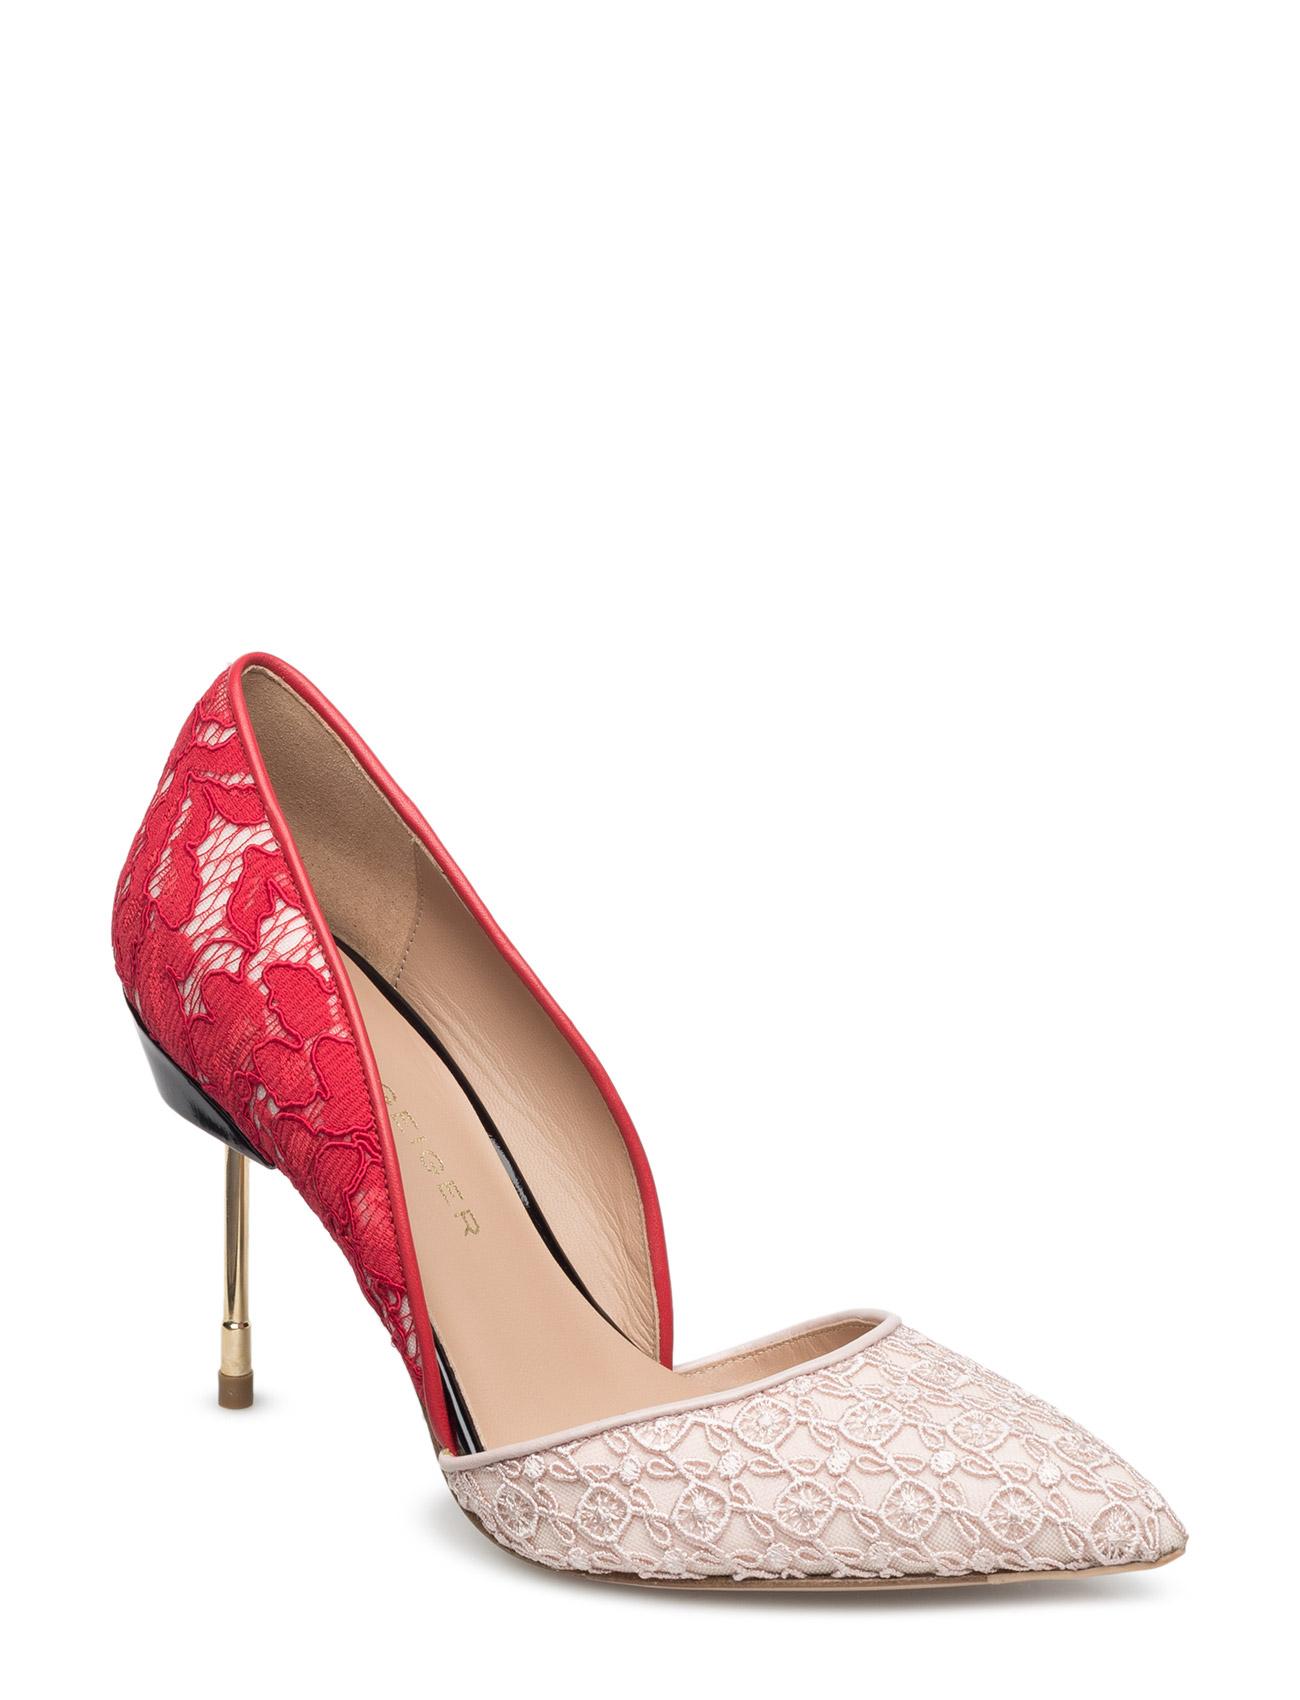 Beaumont Kurt Geiger London Stiletter til Kvinder i Rød